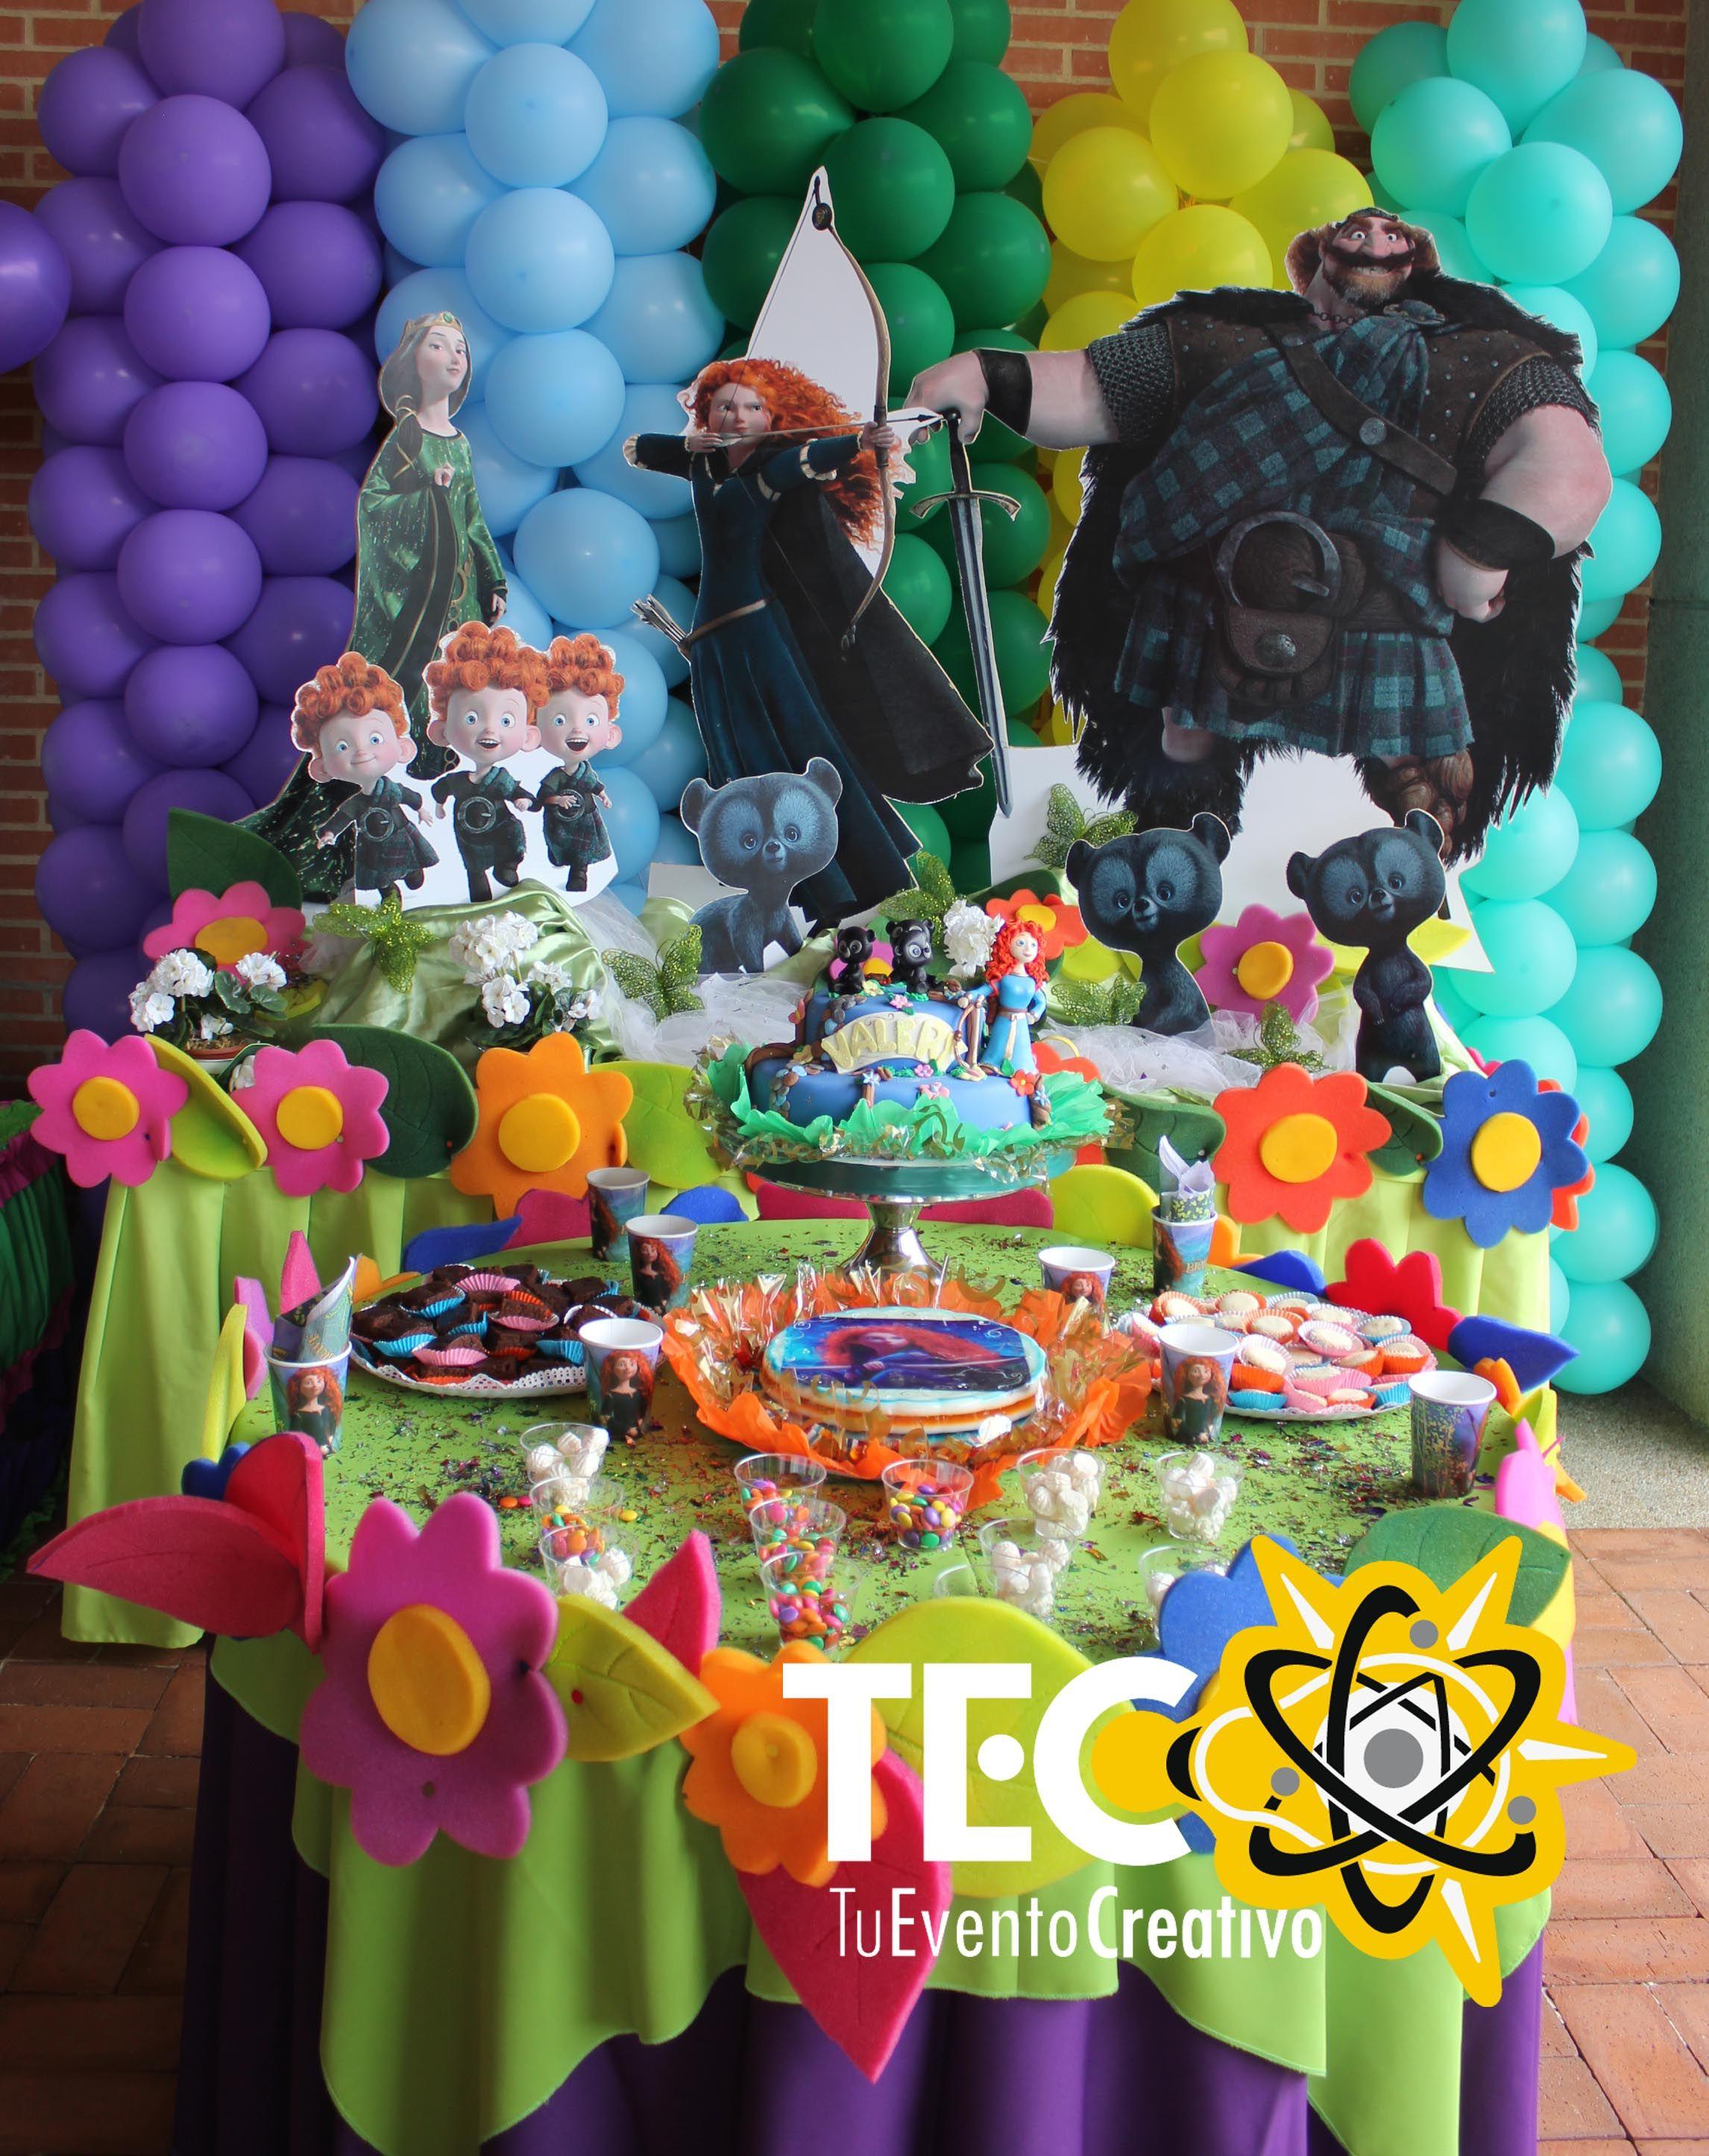 Brave decoration decoracion de valiente mesa de la torta - Decoracion de mesa de cumpleanos infantil ...